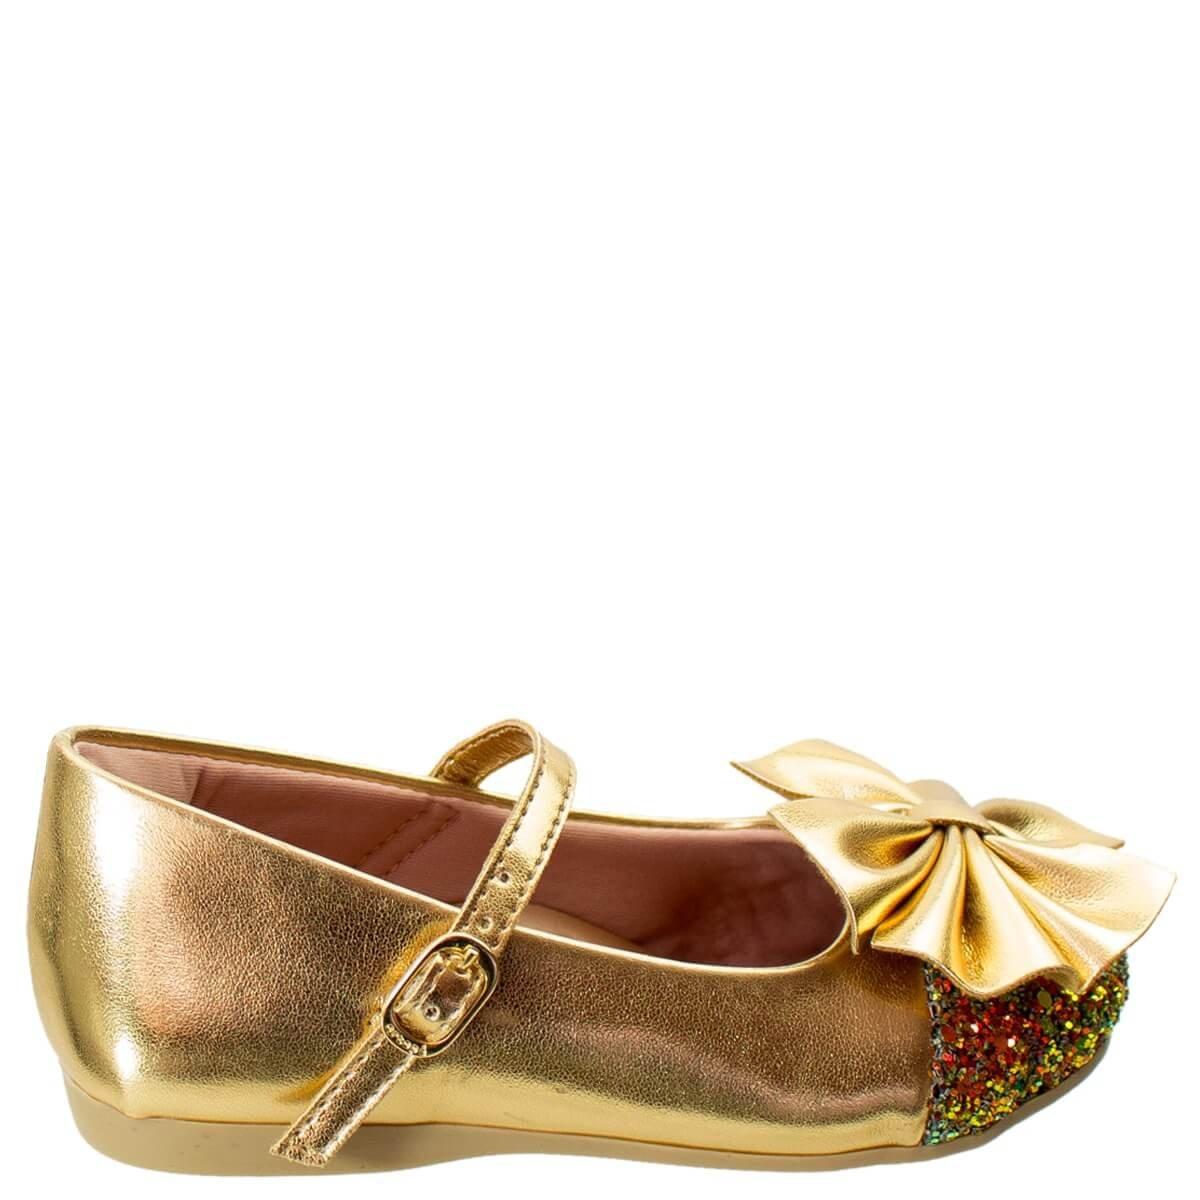 cddc982dcb Bizz Store - Sapatilha Infantil Menina Ortopé Fofura Dourada